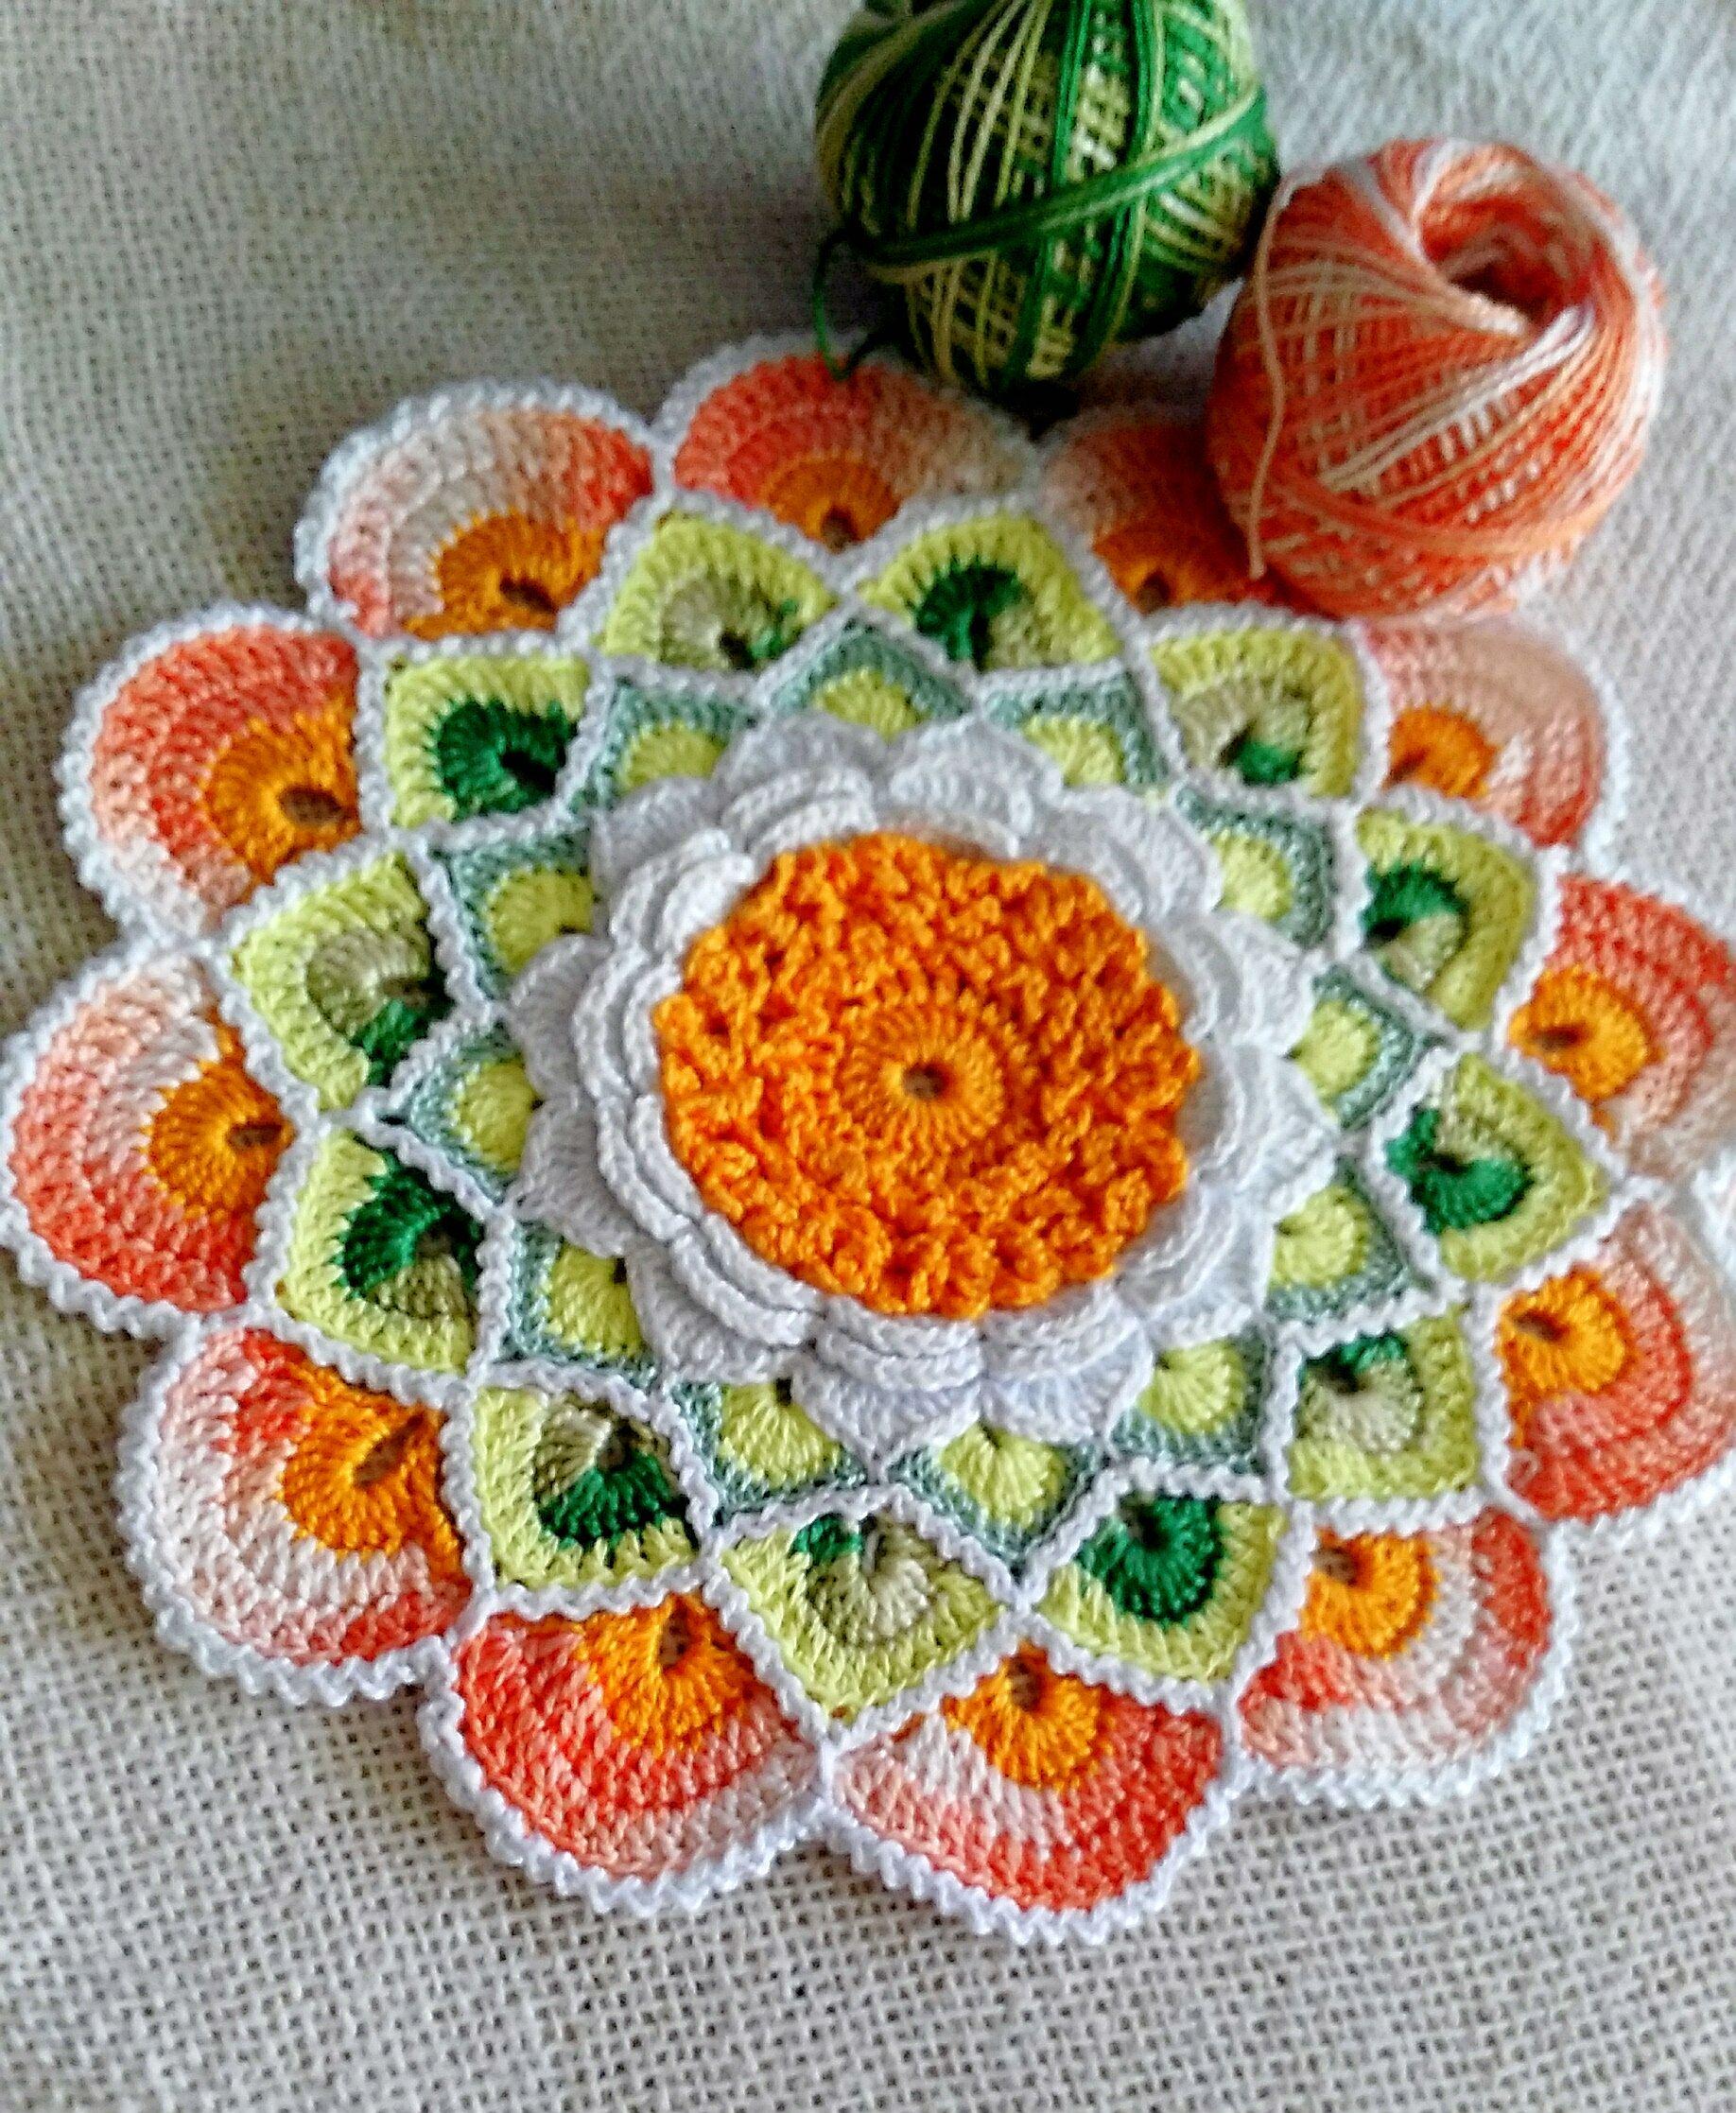 Mandalas a crochet para decorar en casa | Häkeln anleitung, Neid und ...